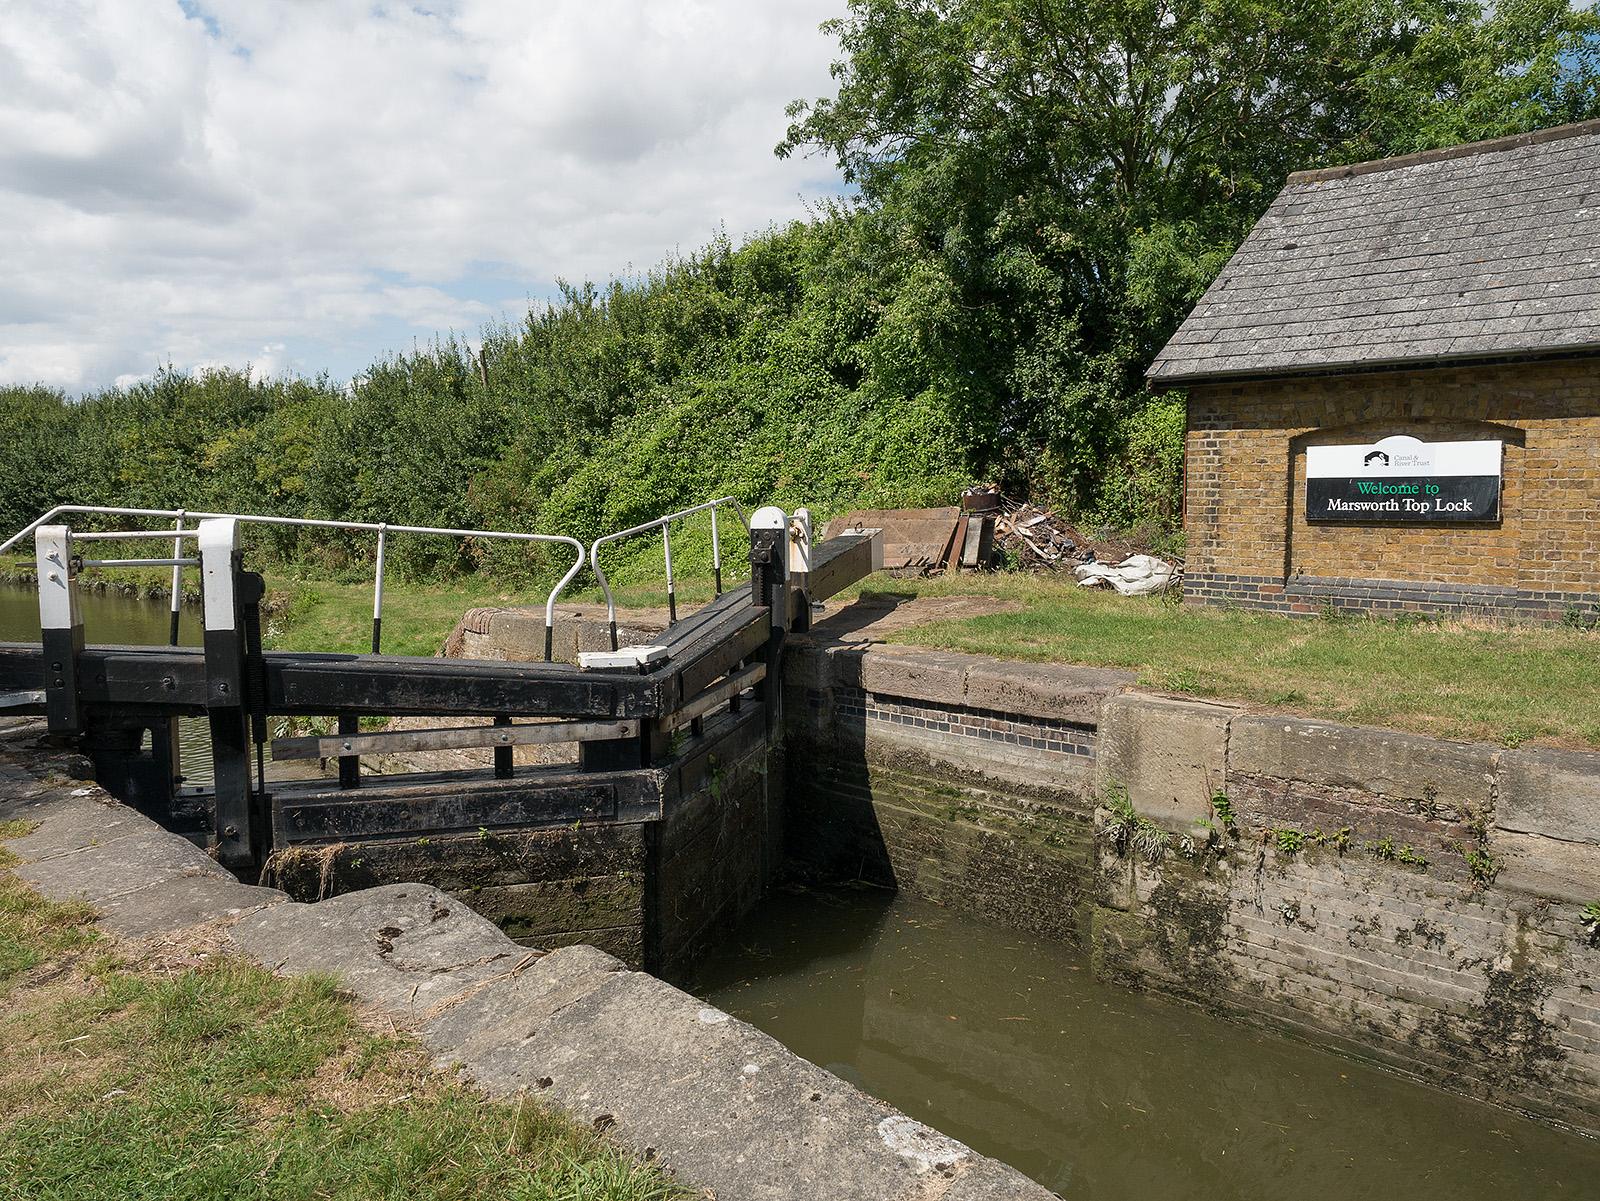 Marsworth Top Lock